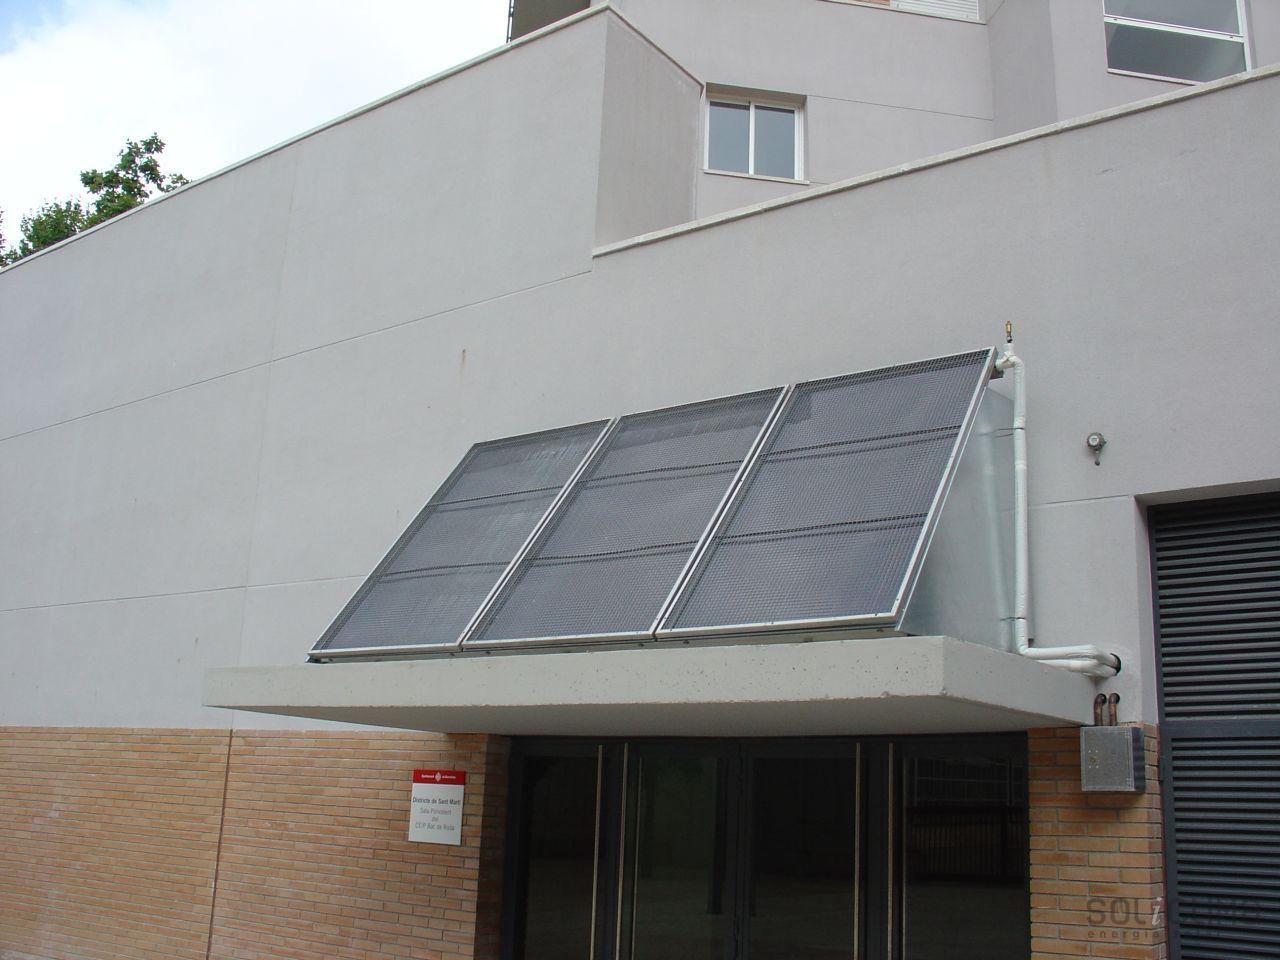 Agua caliente solar - Placas solares agua caliente ...